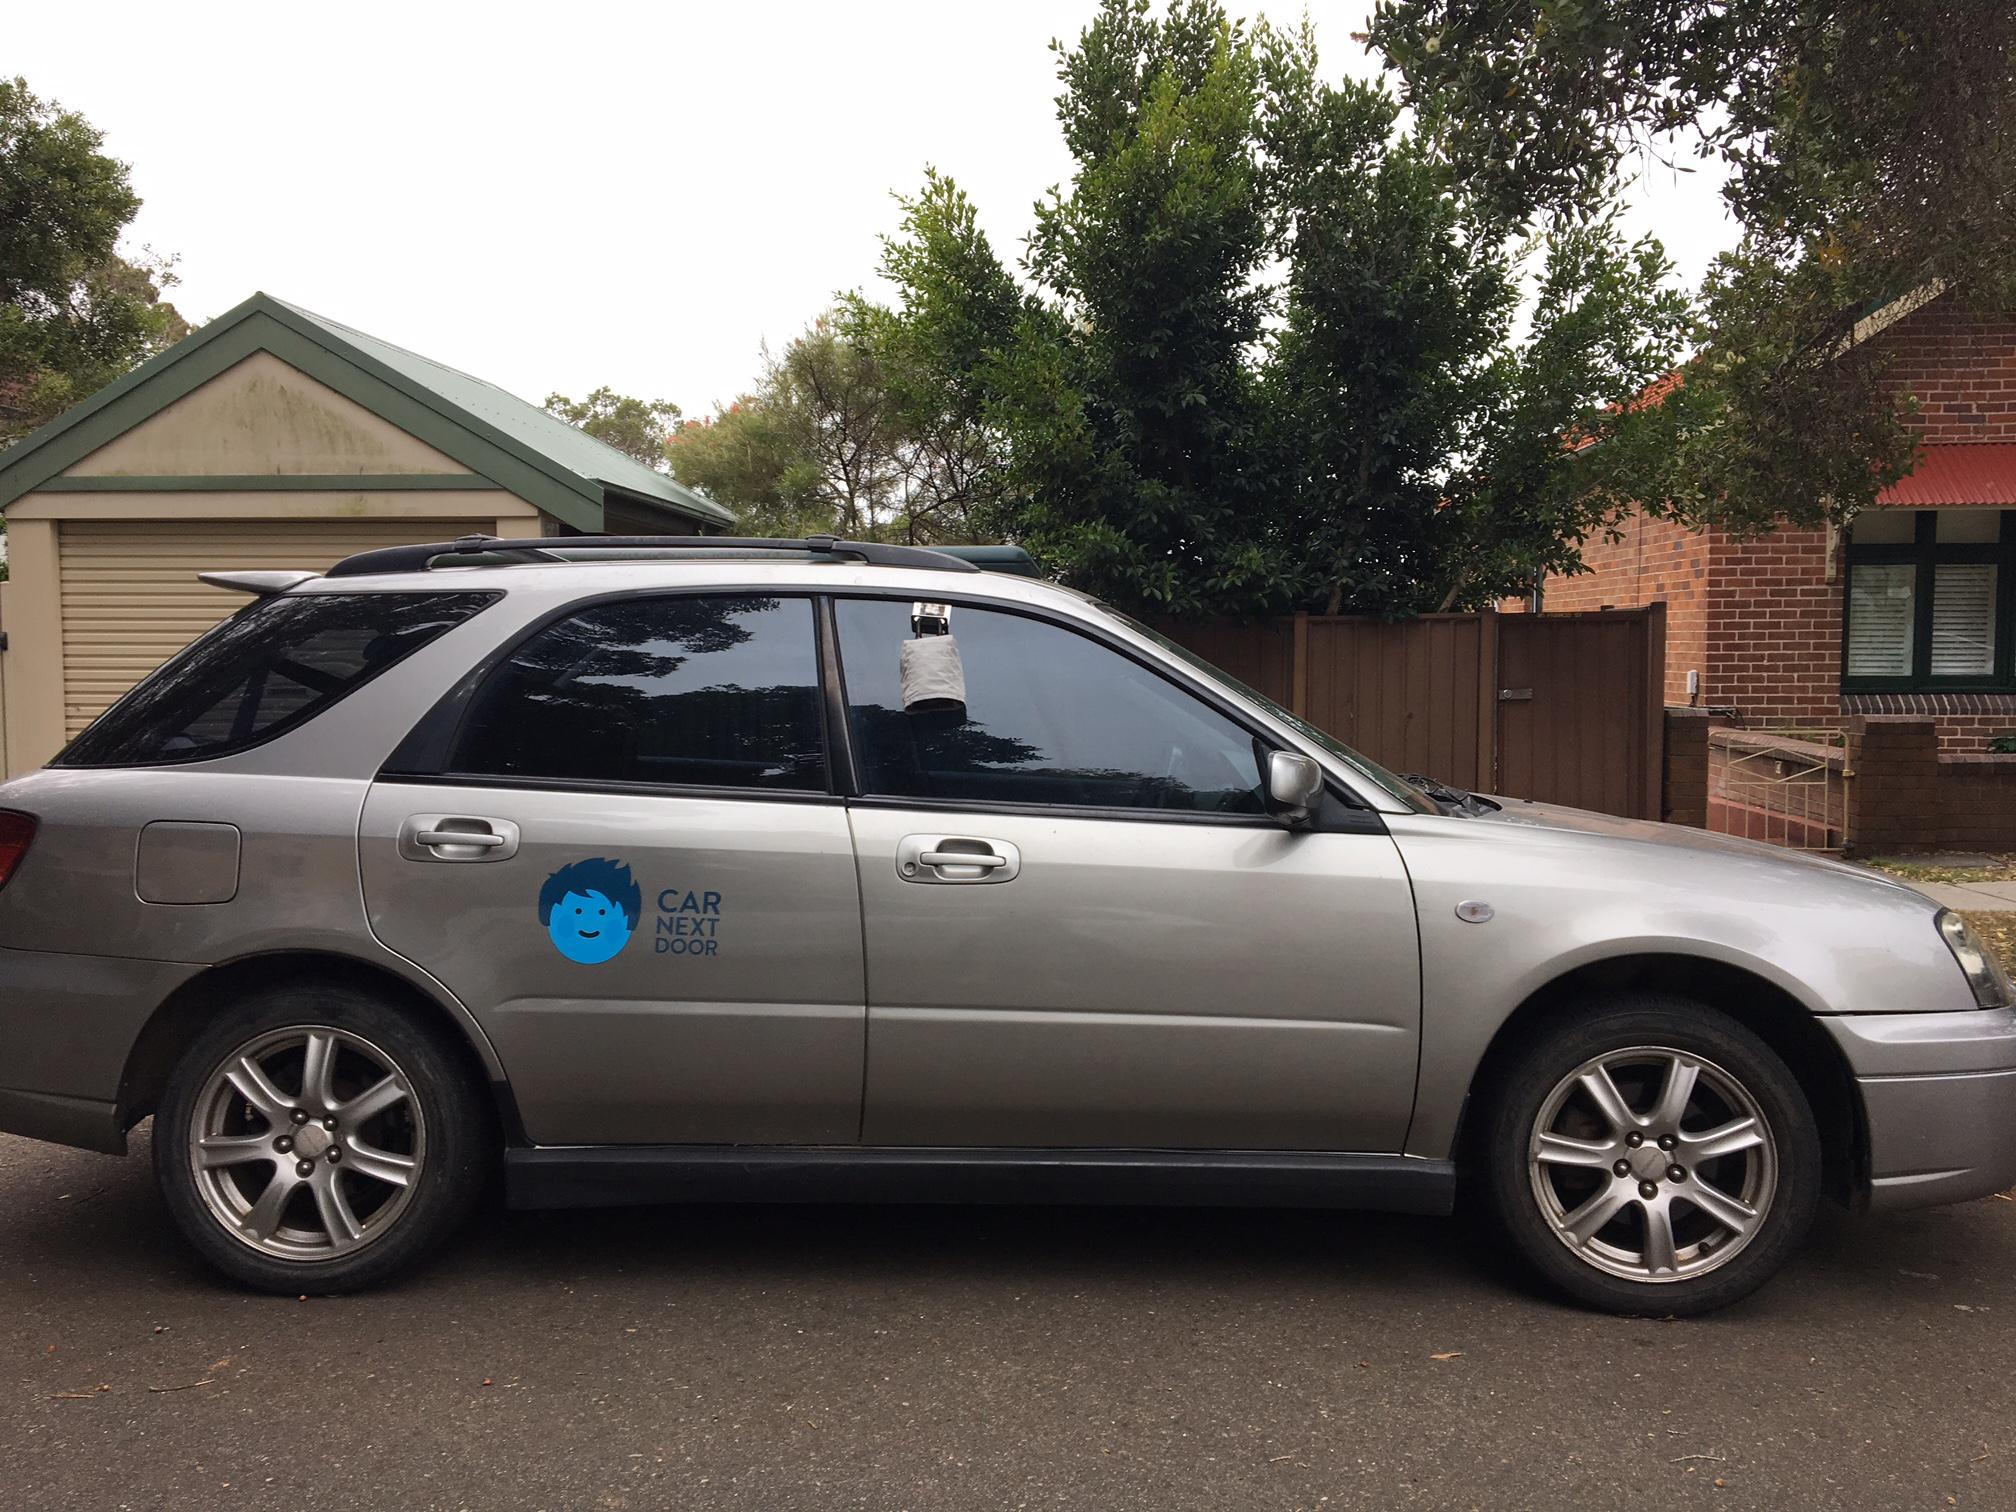 Picture of Rachel's 2005 Subaru Impreza